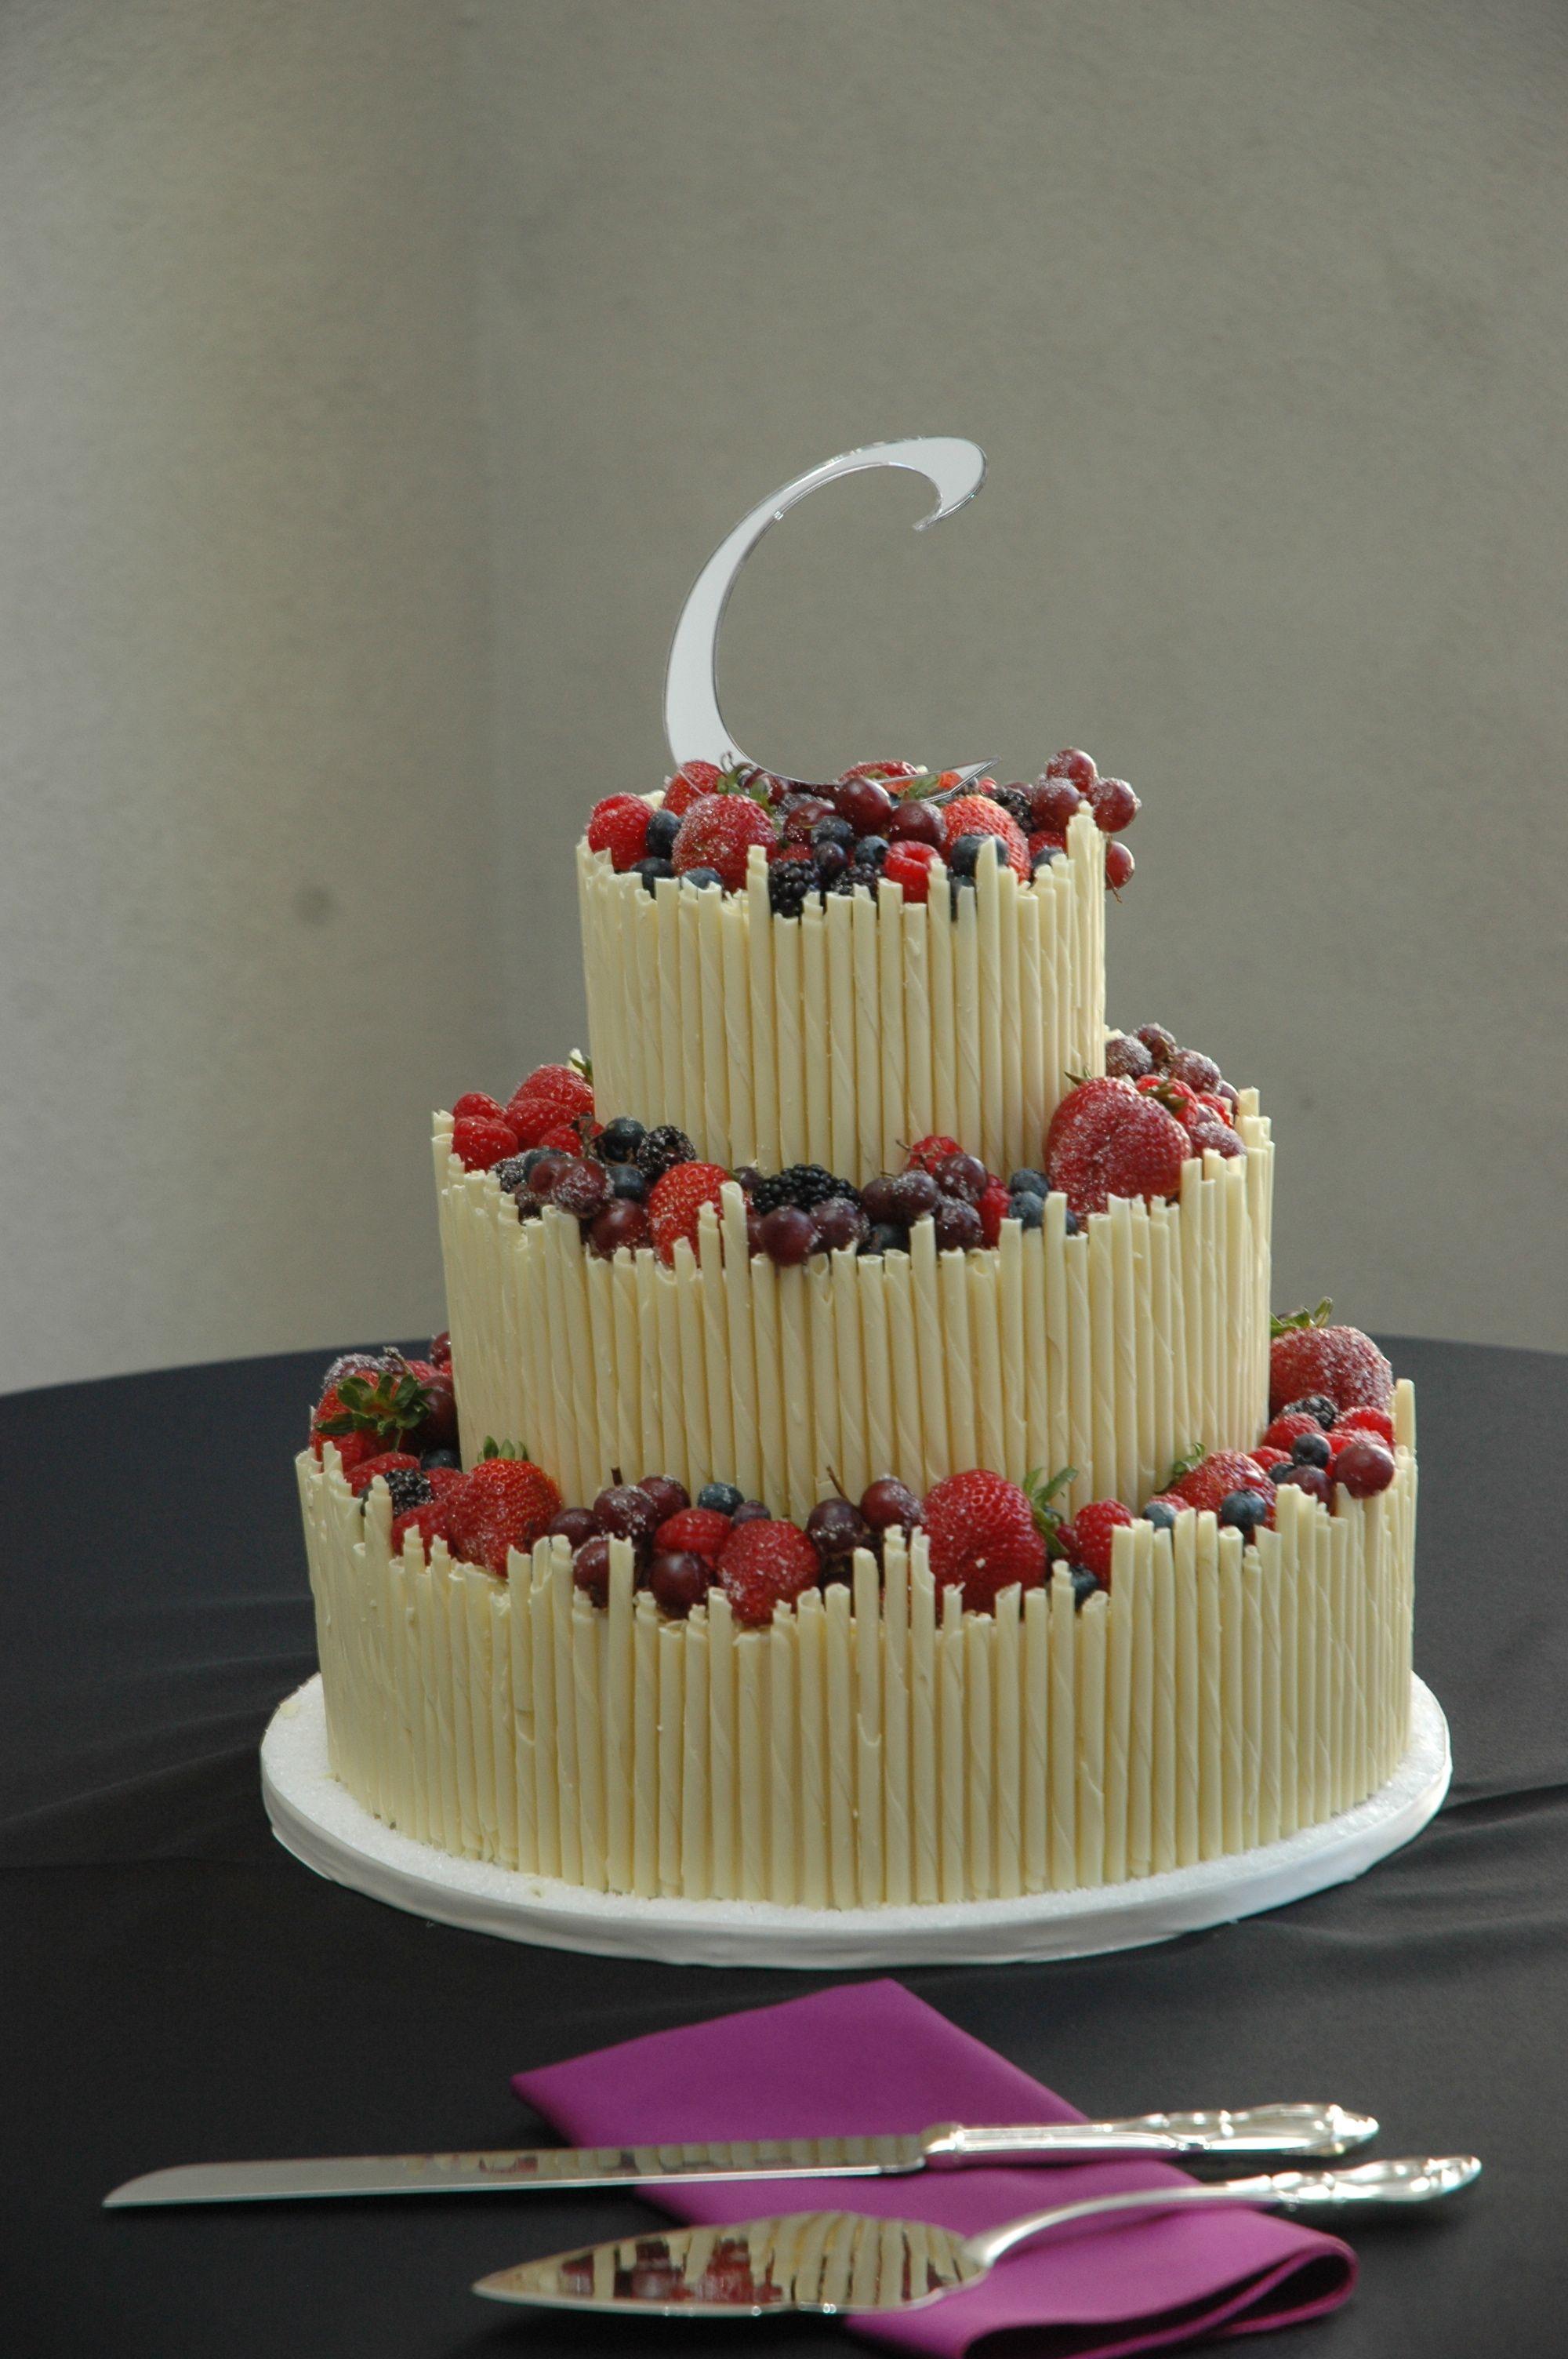 18+ Bake me a cake as fast as you can lyrics ideas